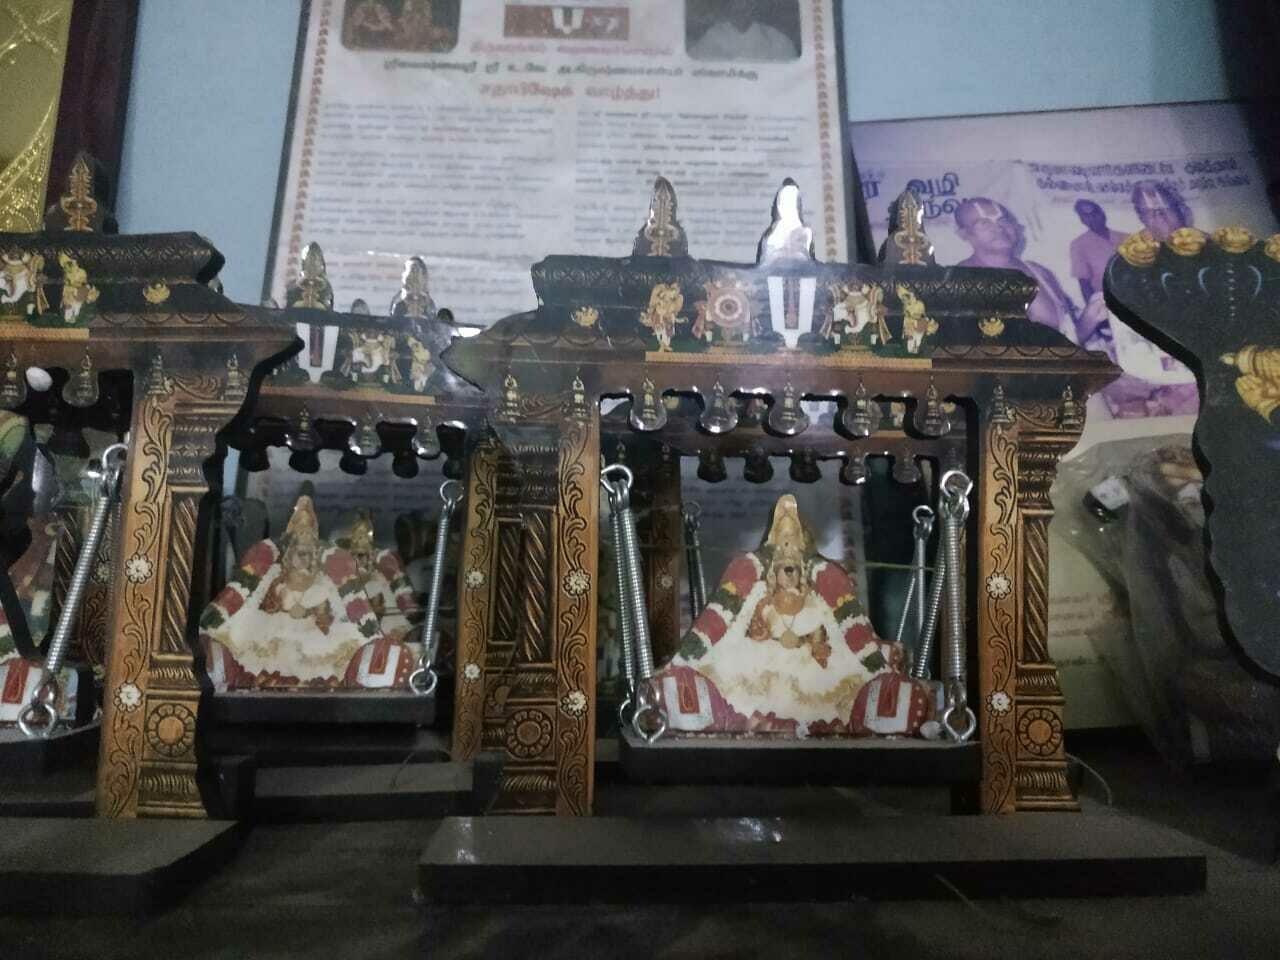 Srirangam Thayar Unjal / Oonjal model ; ஸ்ரீரங்கம் தாயார் ஊஞ்ஜல் கொலுவில் வைக்க / பரிசுப்பொருள்